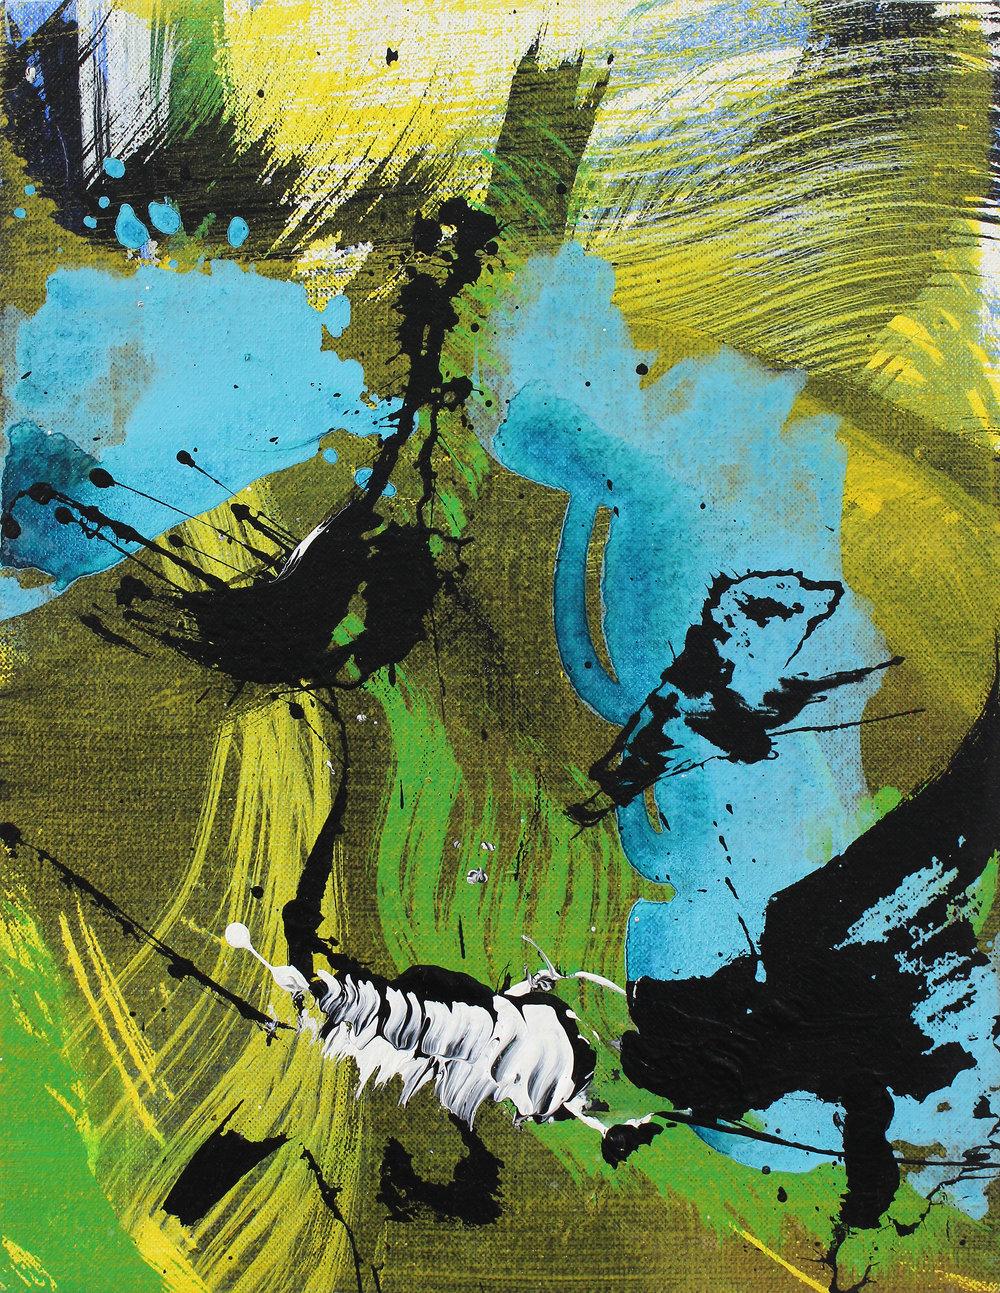 Juan Olivares-Untitled IX-2014- 35 x 27 cm-Acrylic on canvas.jpg